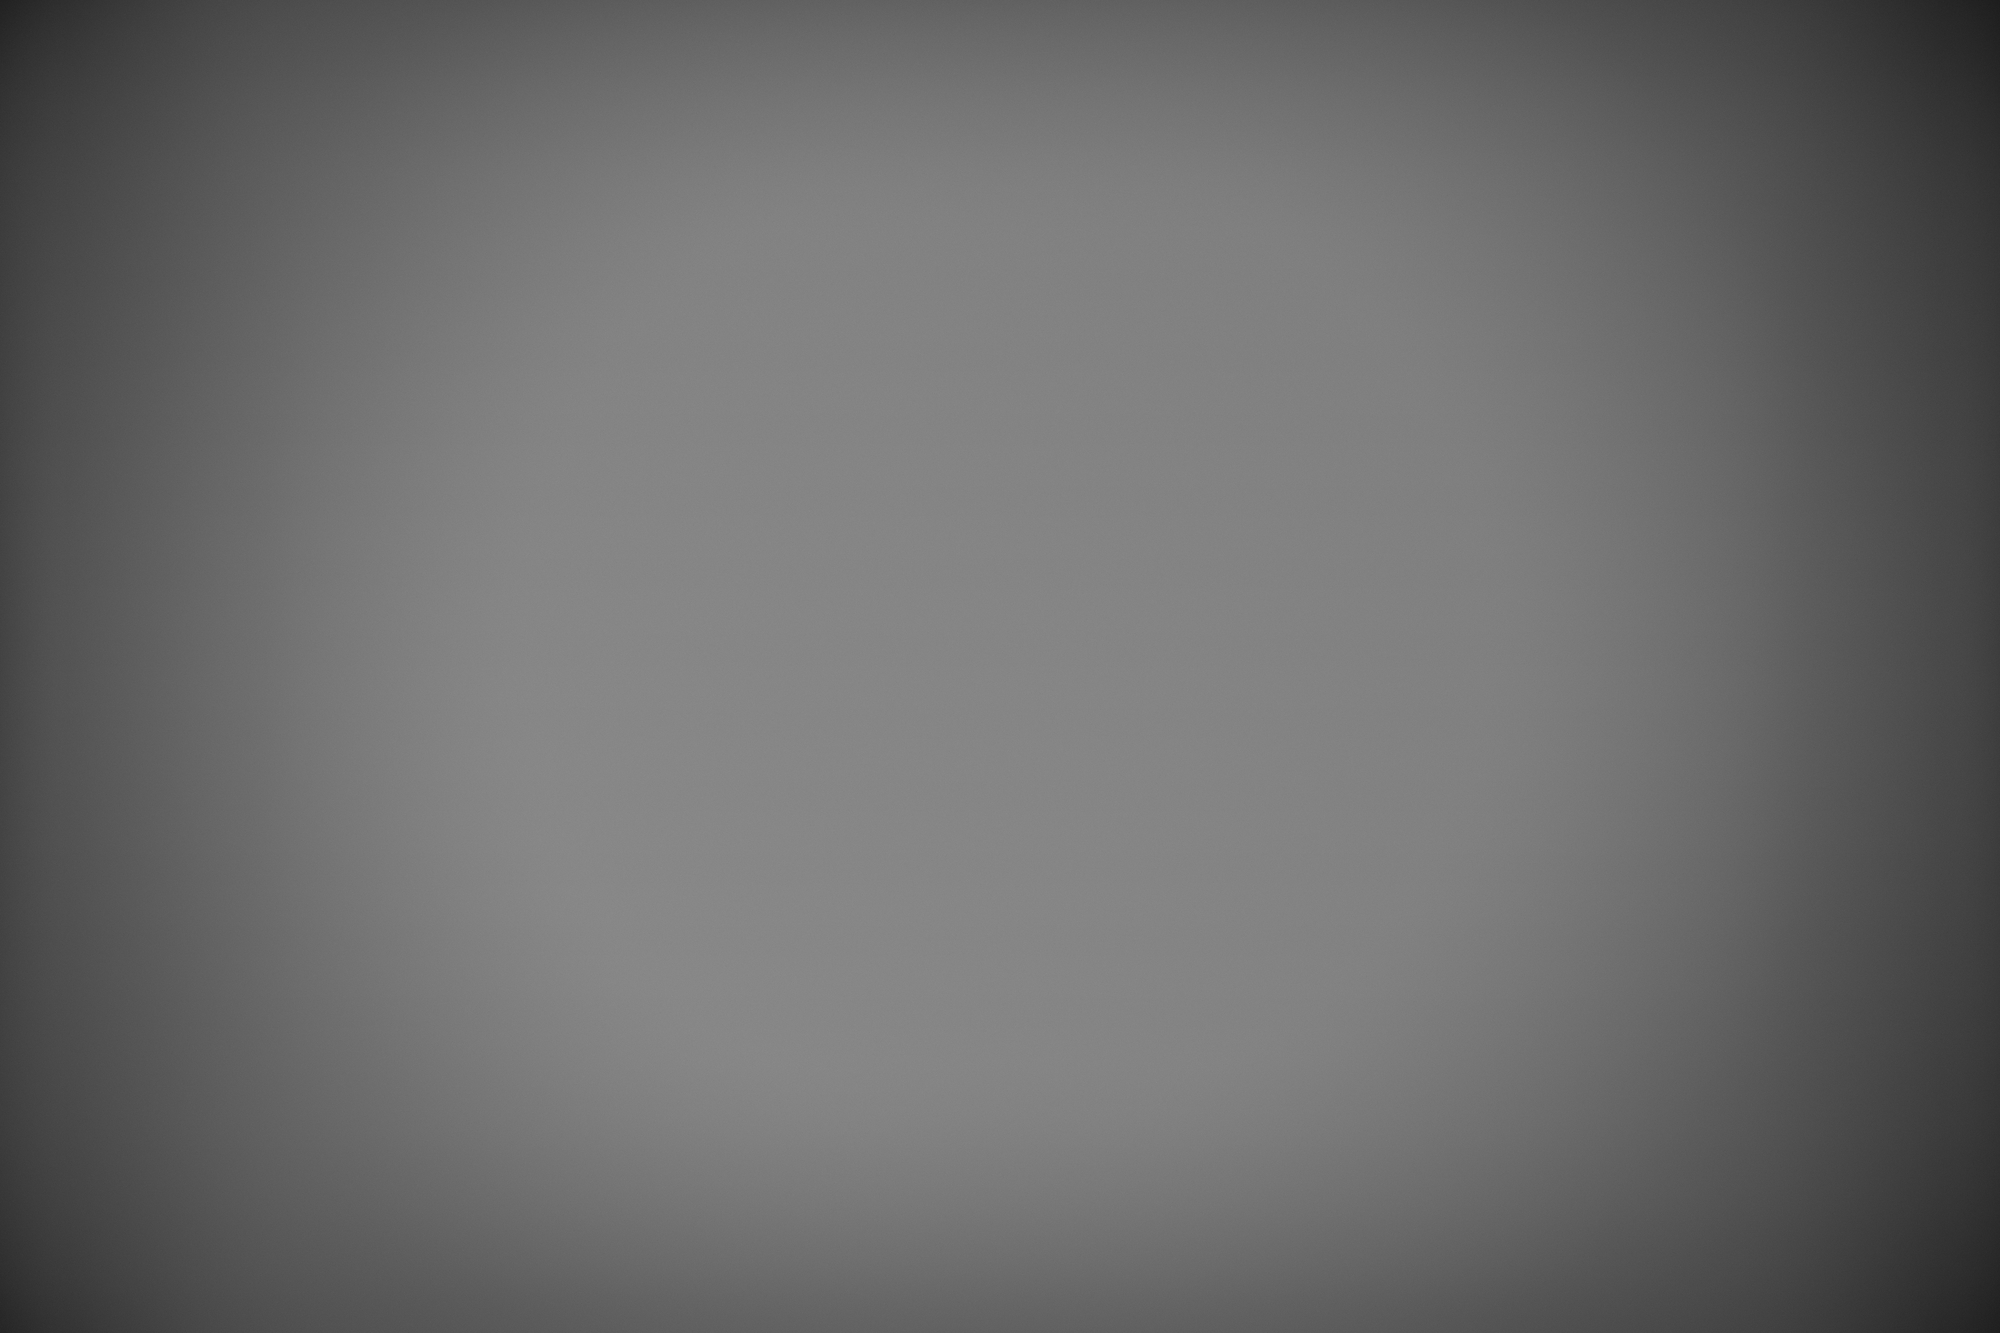 f:id:snct-astro:20200415174044j:plain